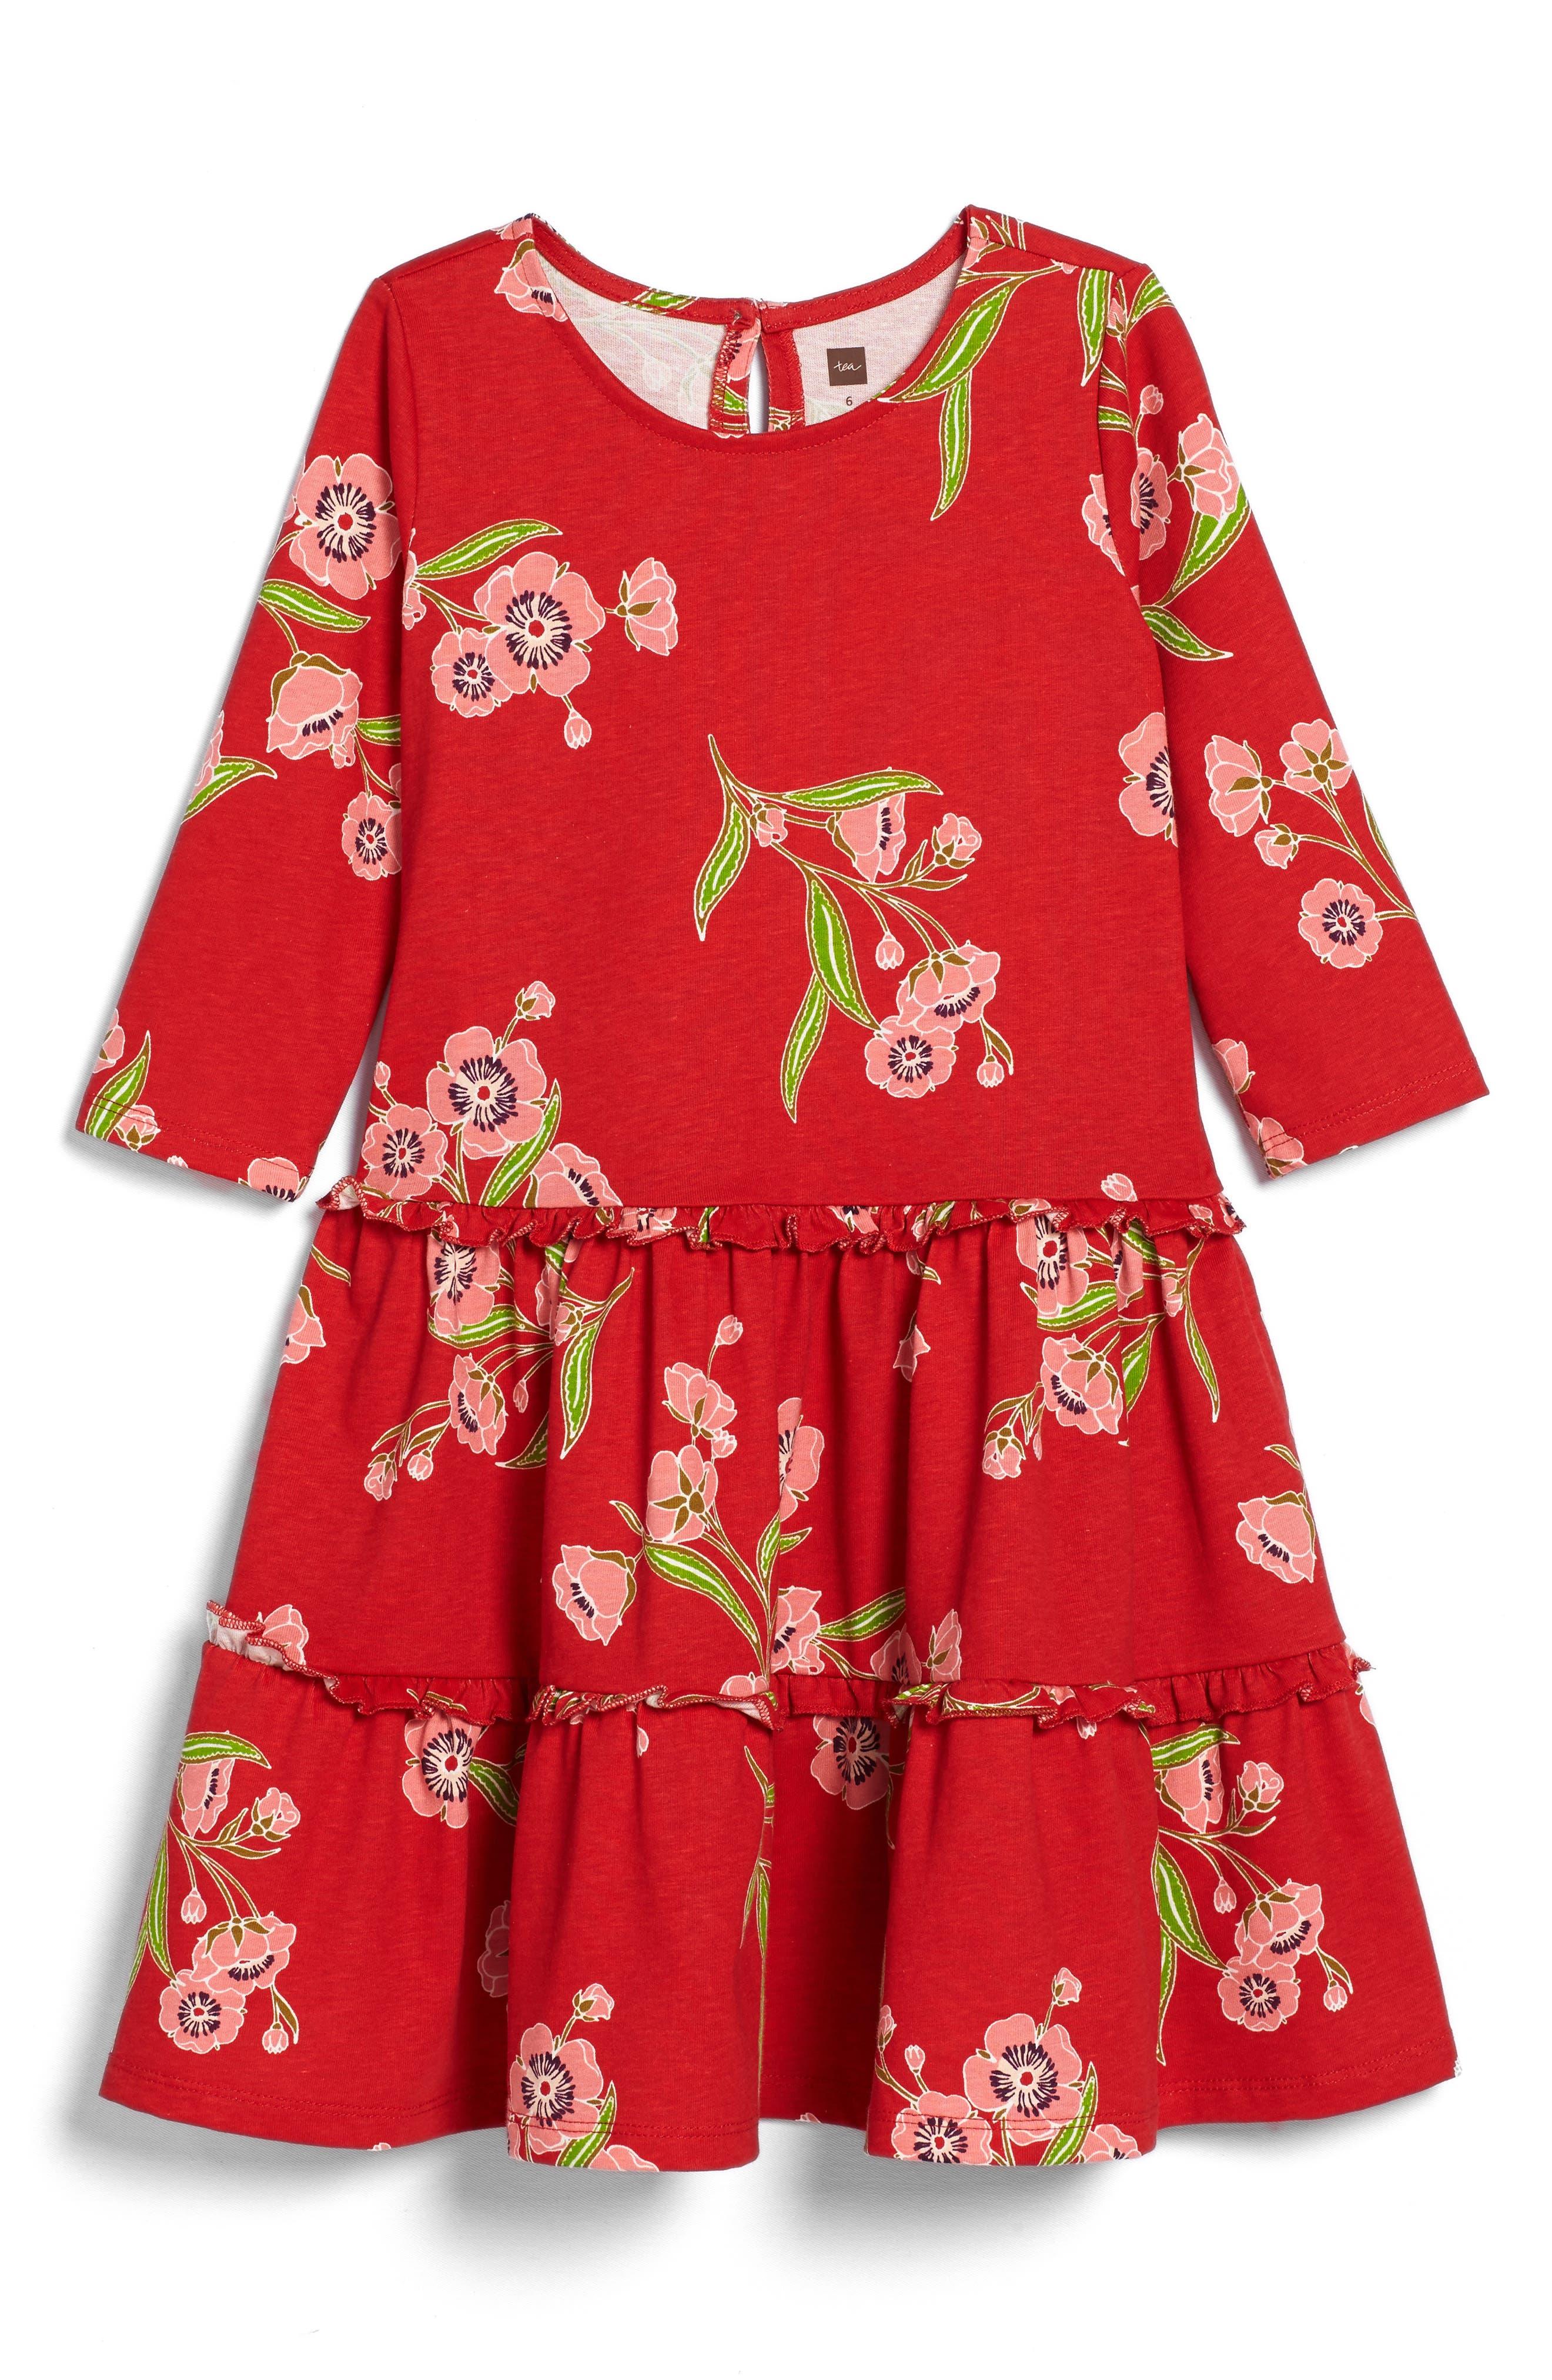 Rowan Floral Print Tiered Dress,                         Main,                         color, 615